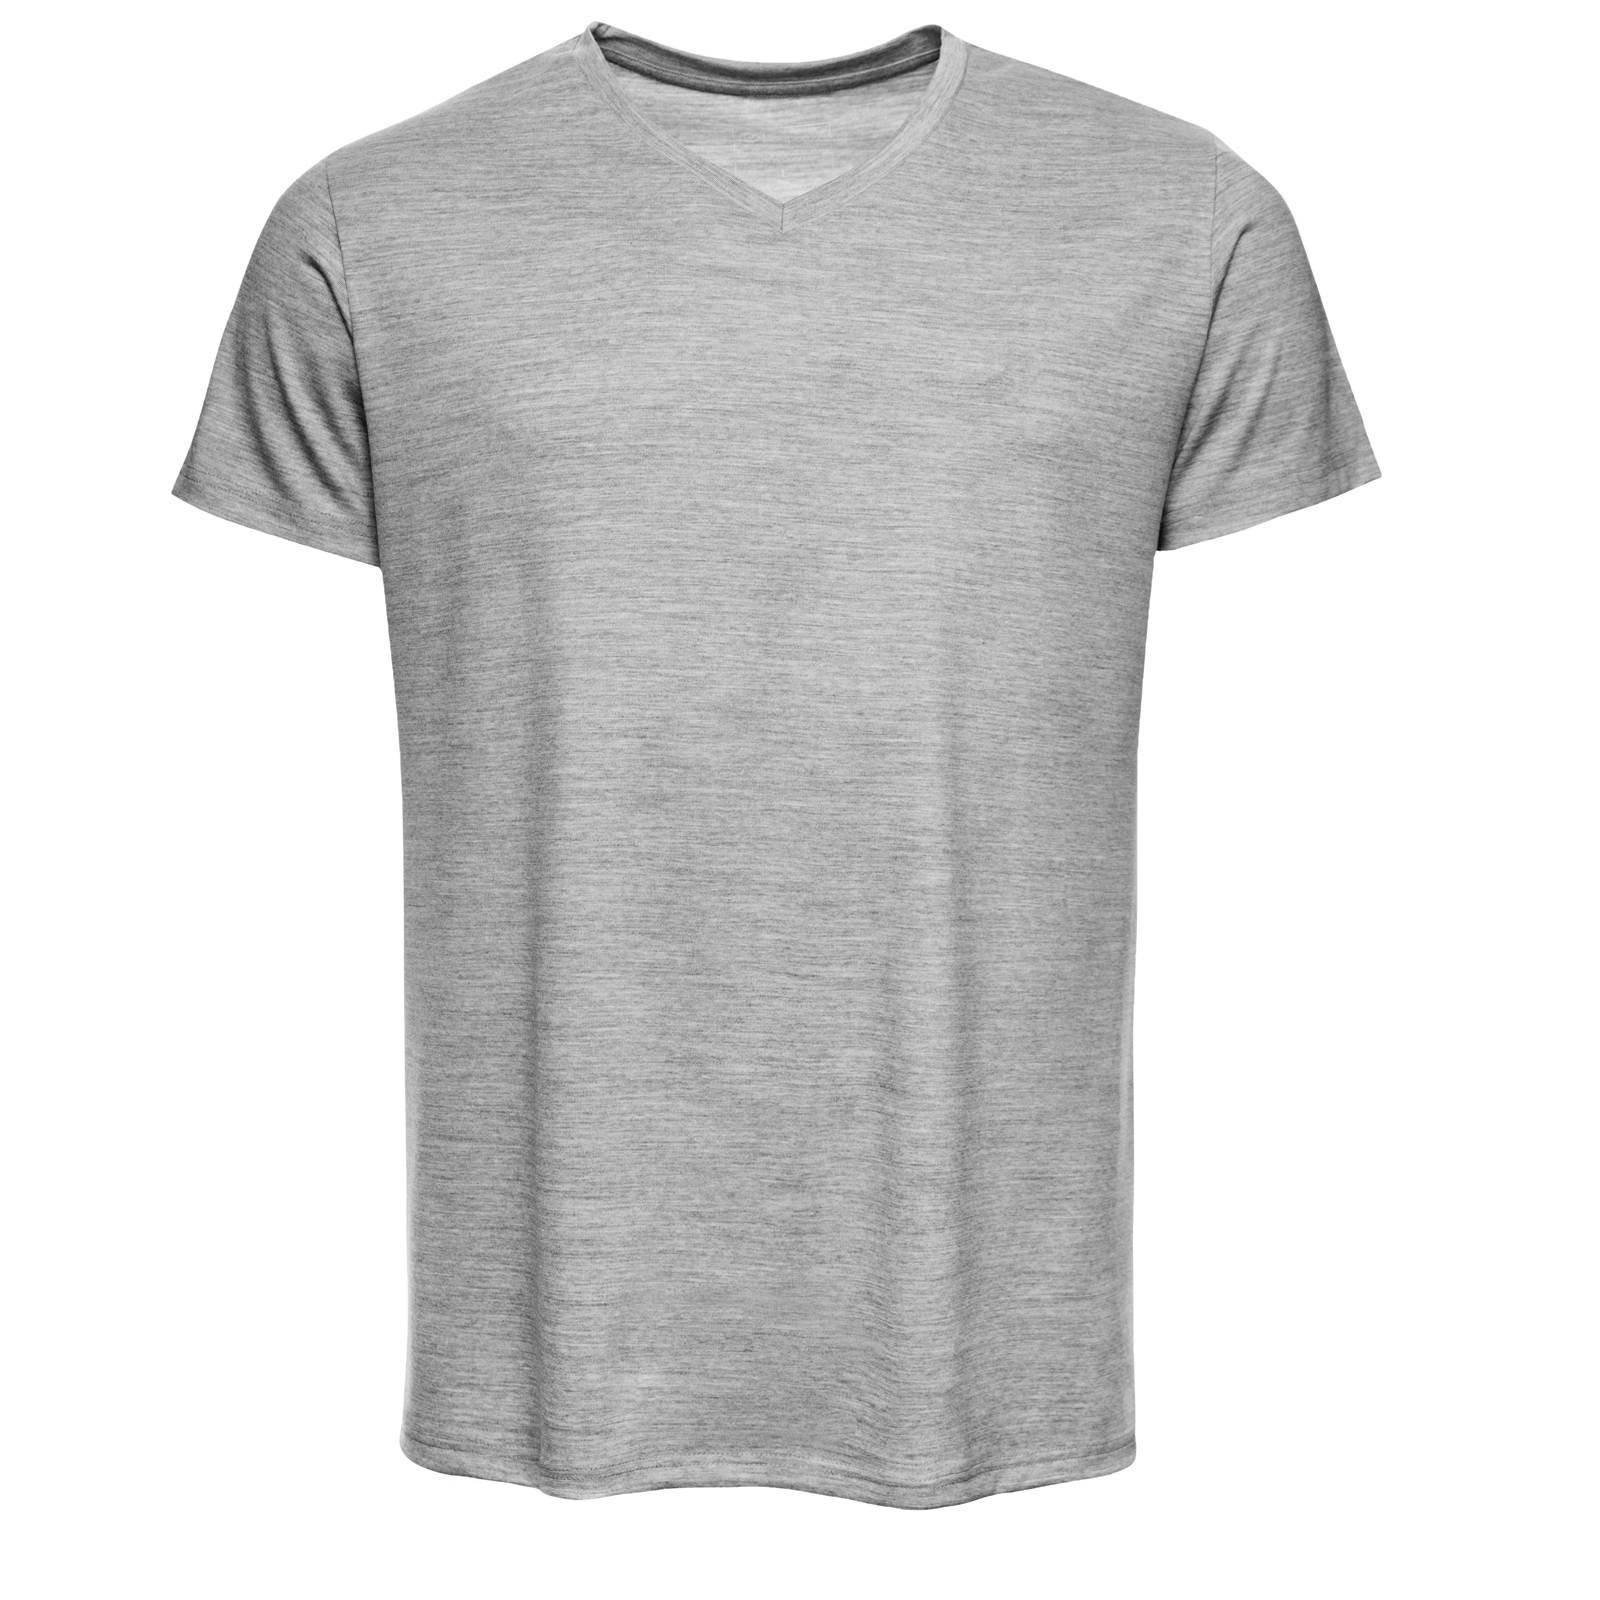 URBAN LIMITED Merino Shirt Herren Regular V-Neck 200 Grau-Melange XXL